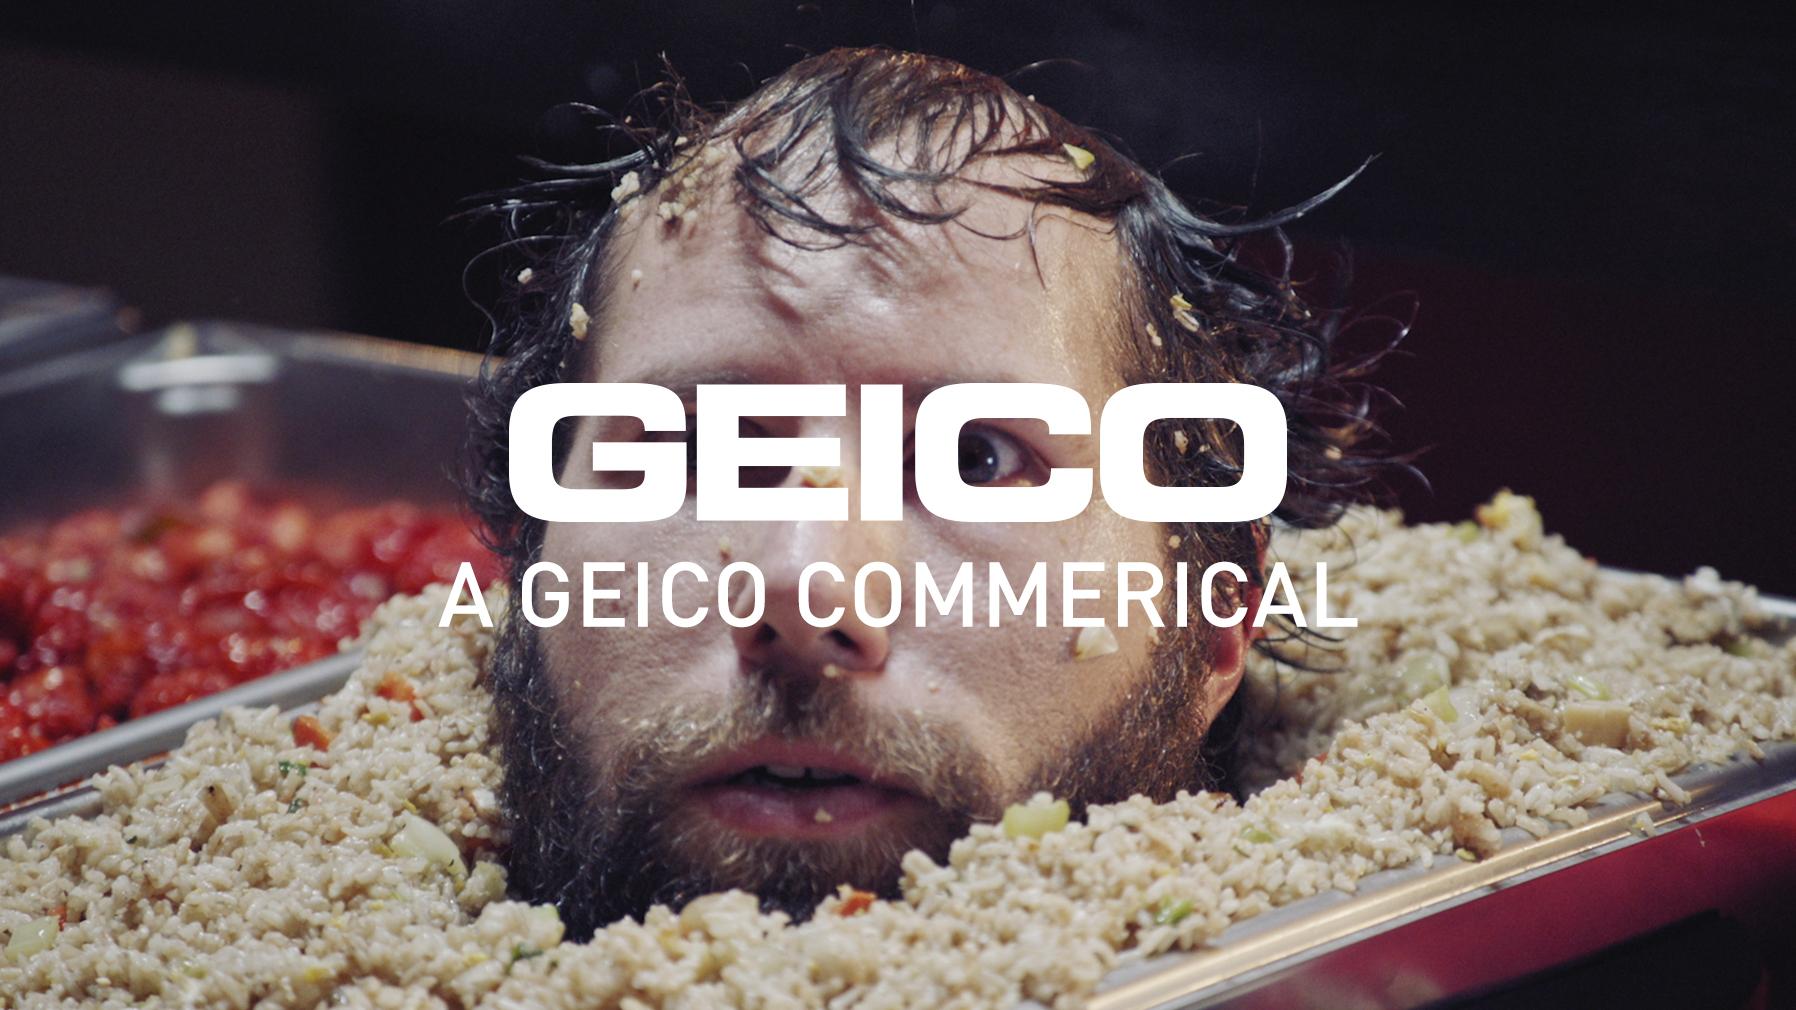 aGEICOcommercial.jpg